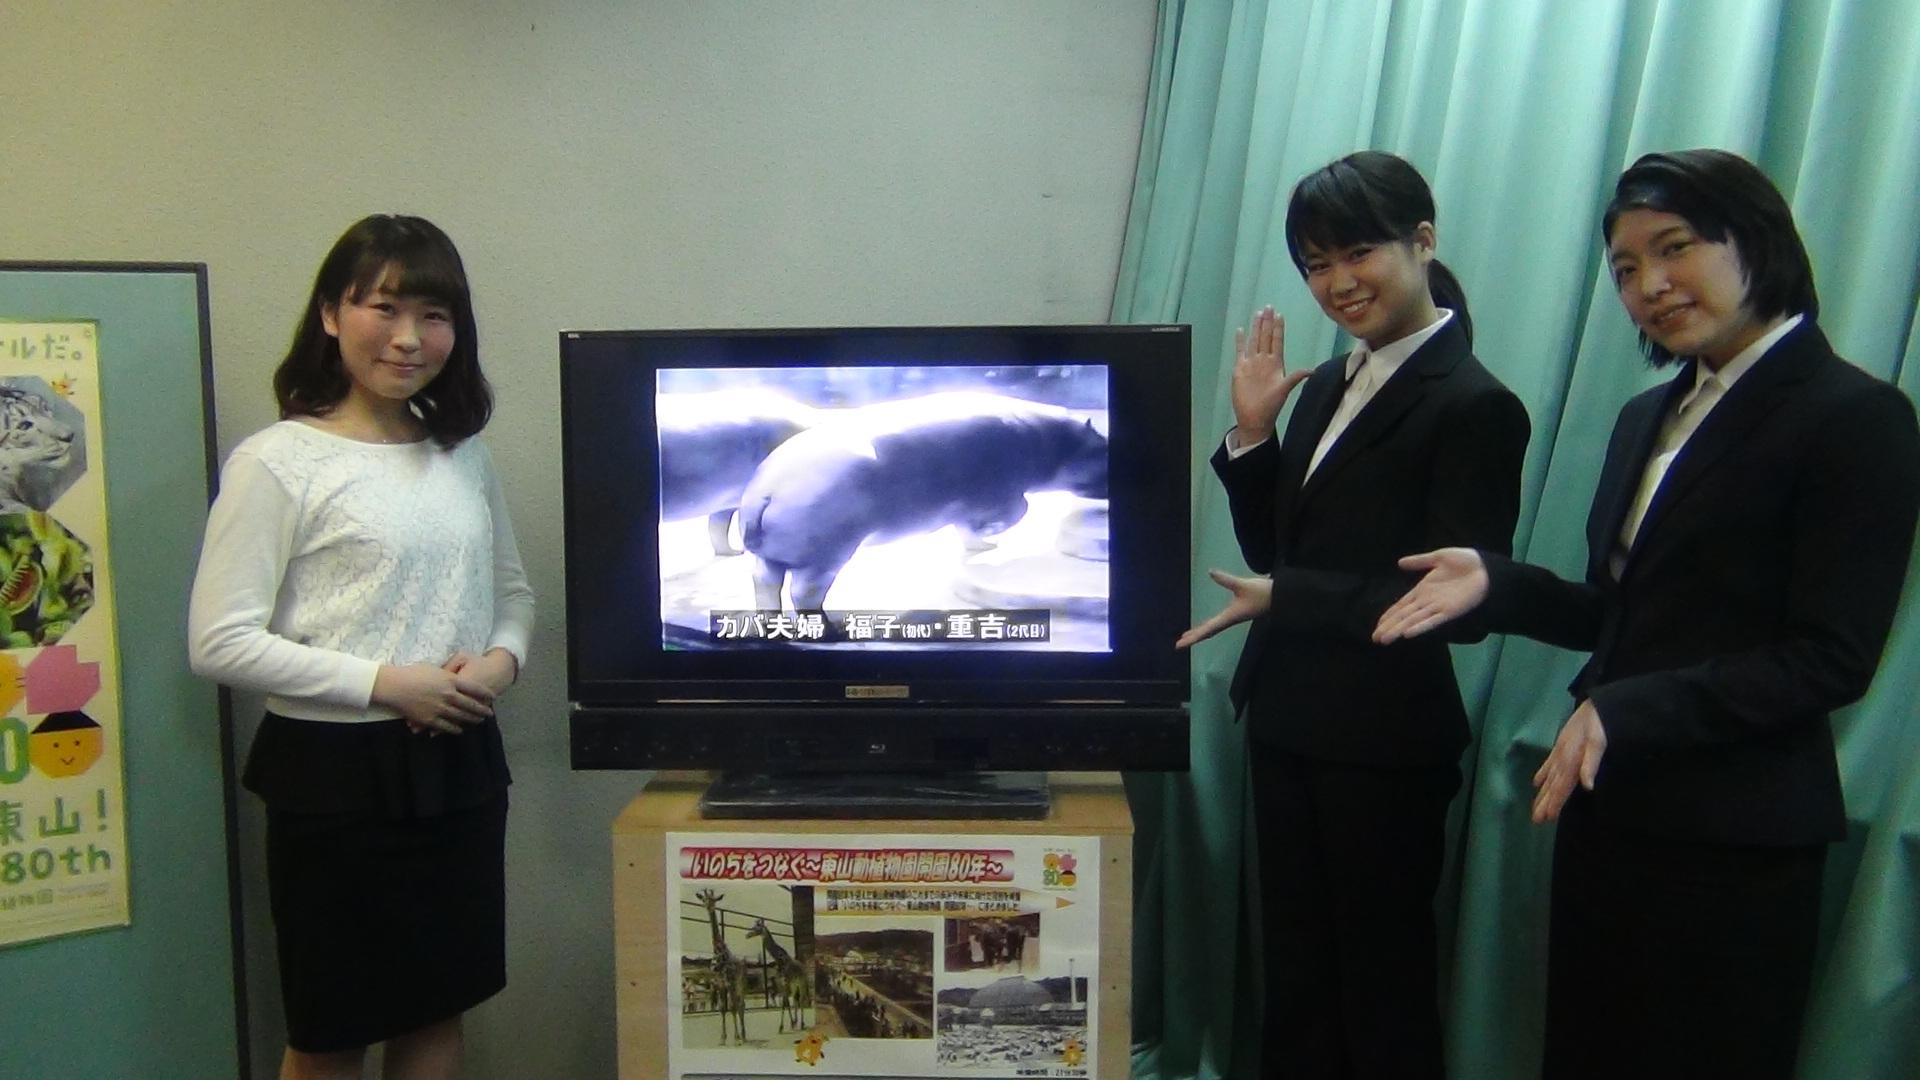 http://tochikubo.ci.sugiyama-u.ac.jp/news/assets/images/DSC00771.JPG